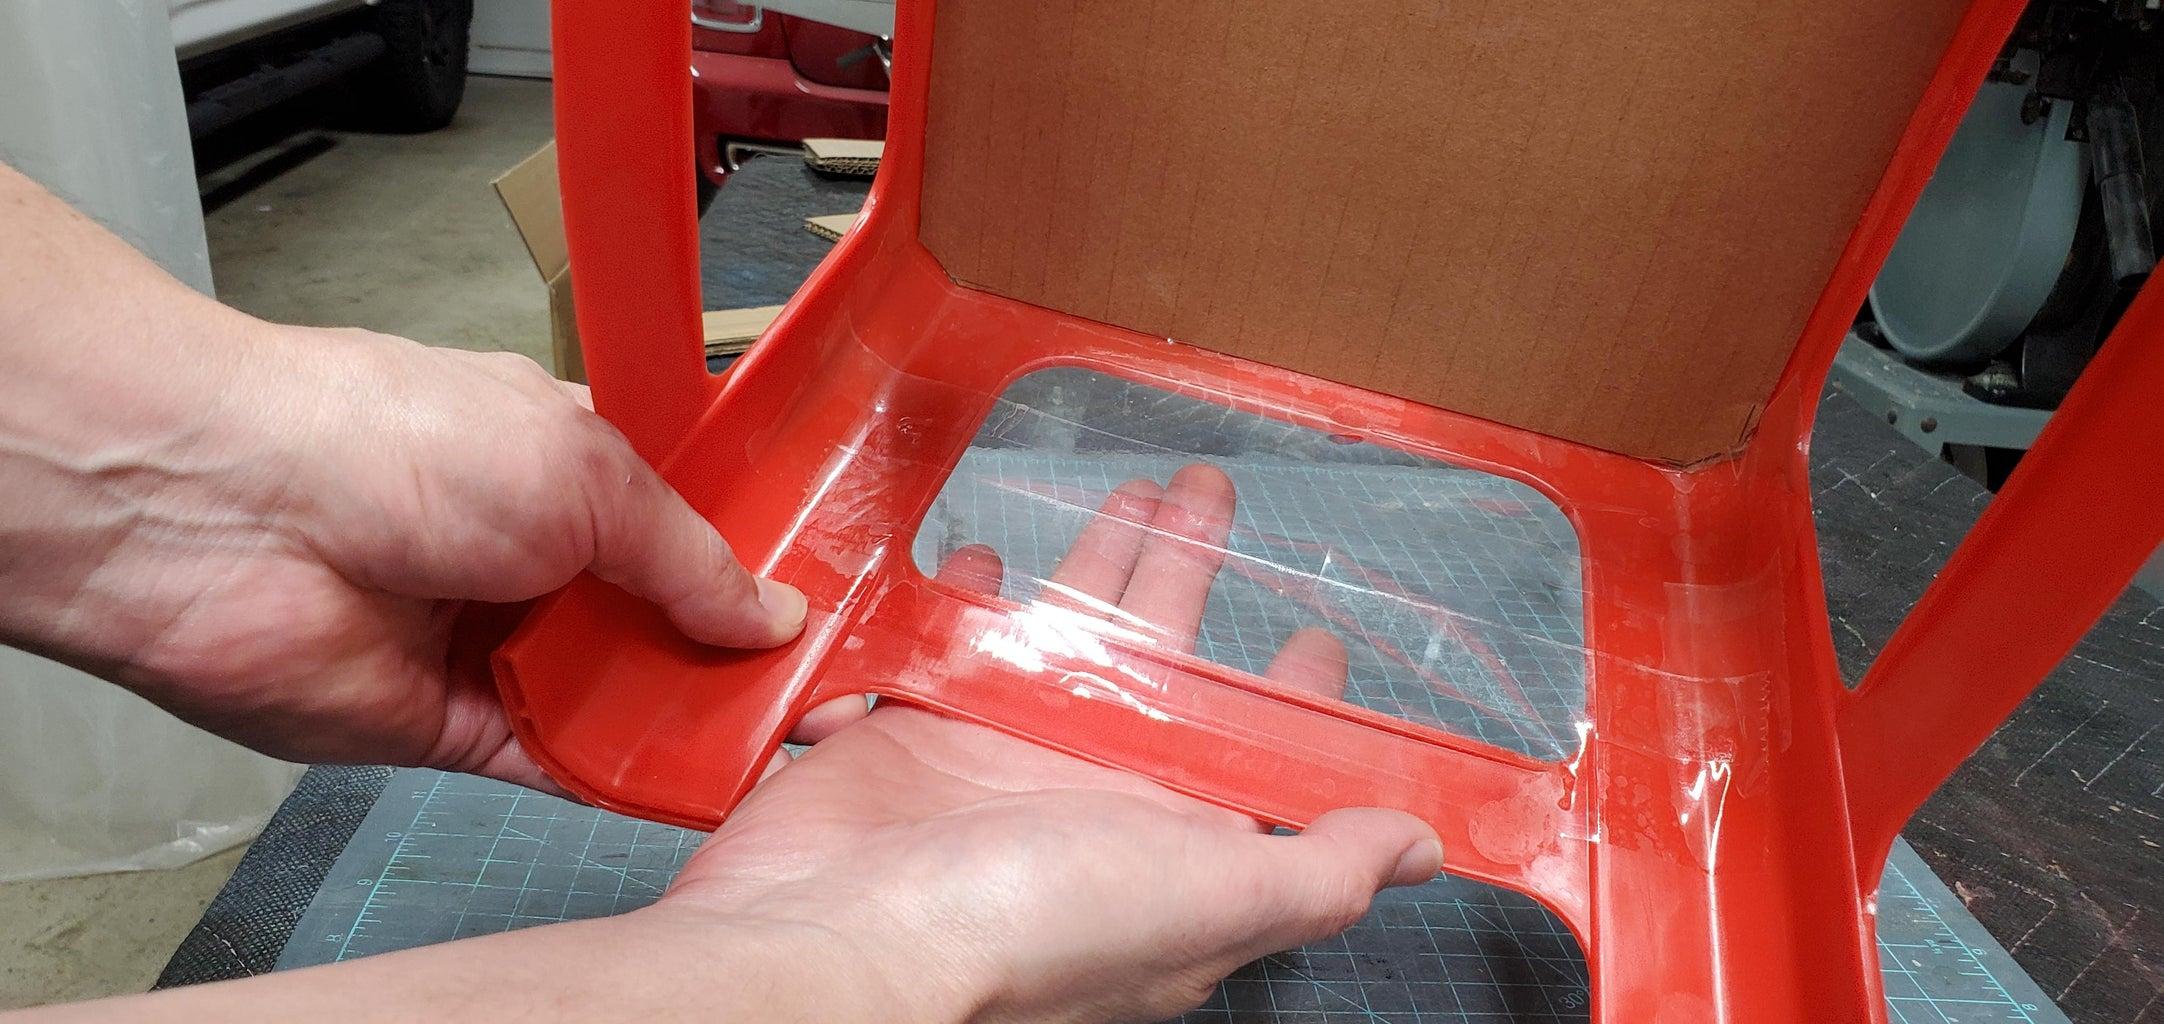 Sealing Off Holes